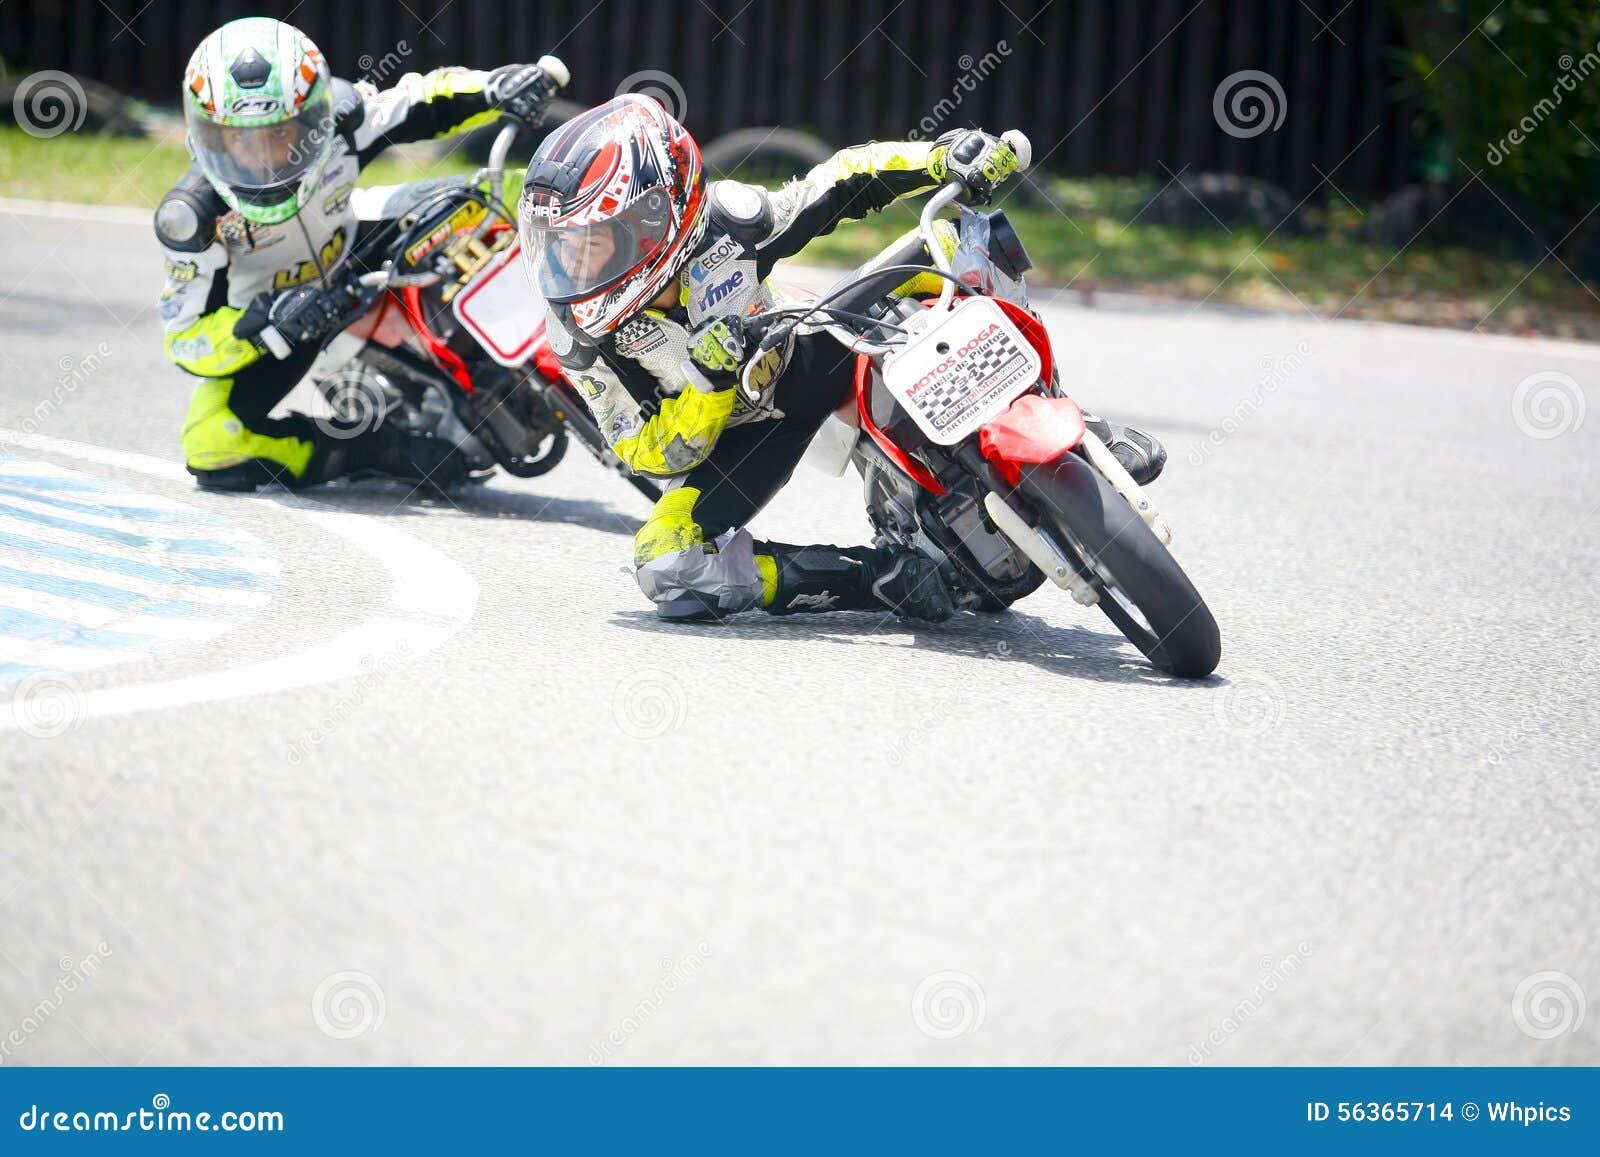 Motocross children bikers editorial stock image. Image of small ...